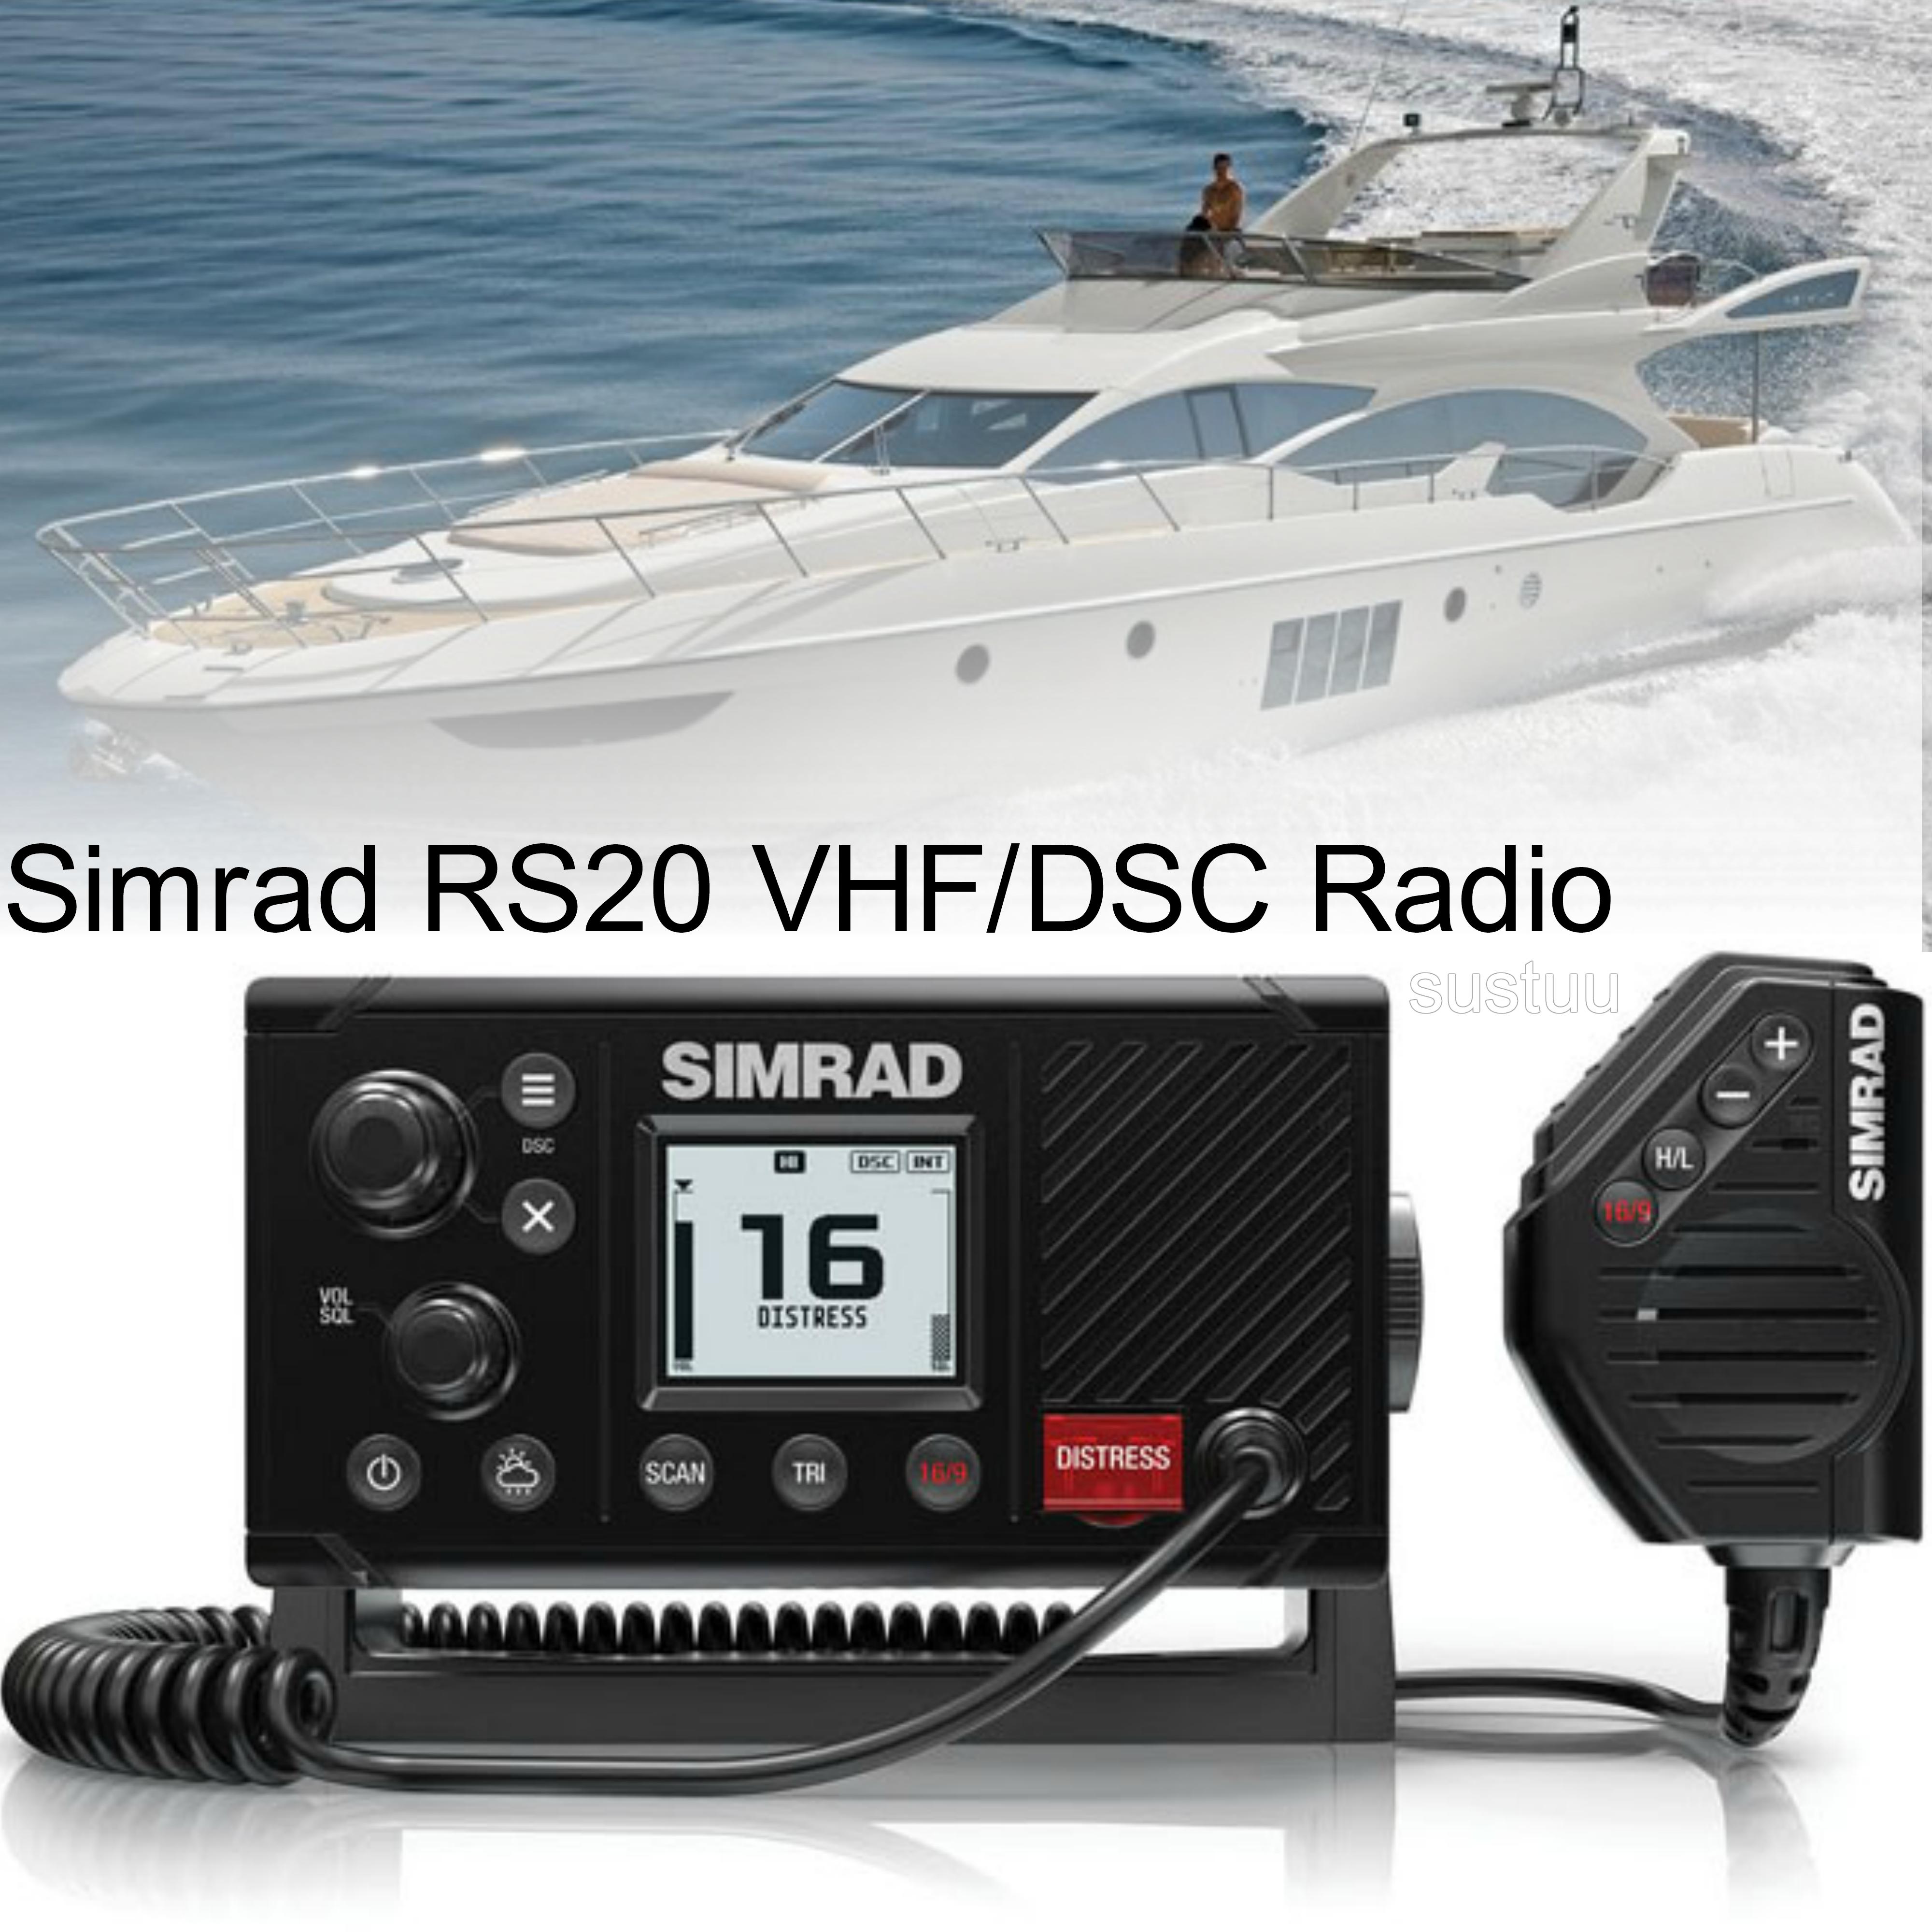 Simrad RS20 Marine VHF LCD Radio|Class D DSC|Rotary & Keypad Controls|NMEA 2000